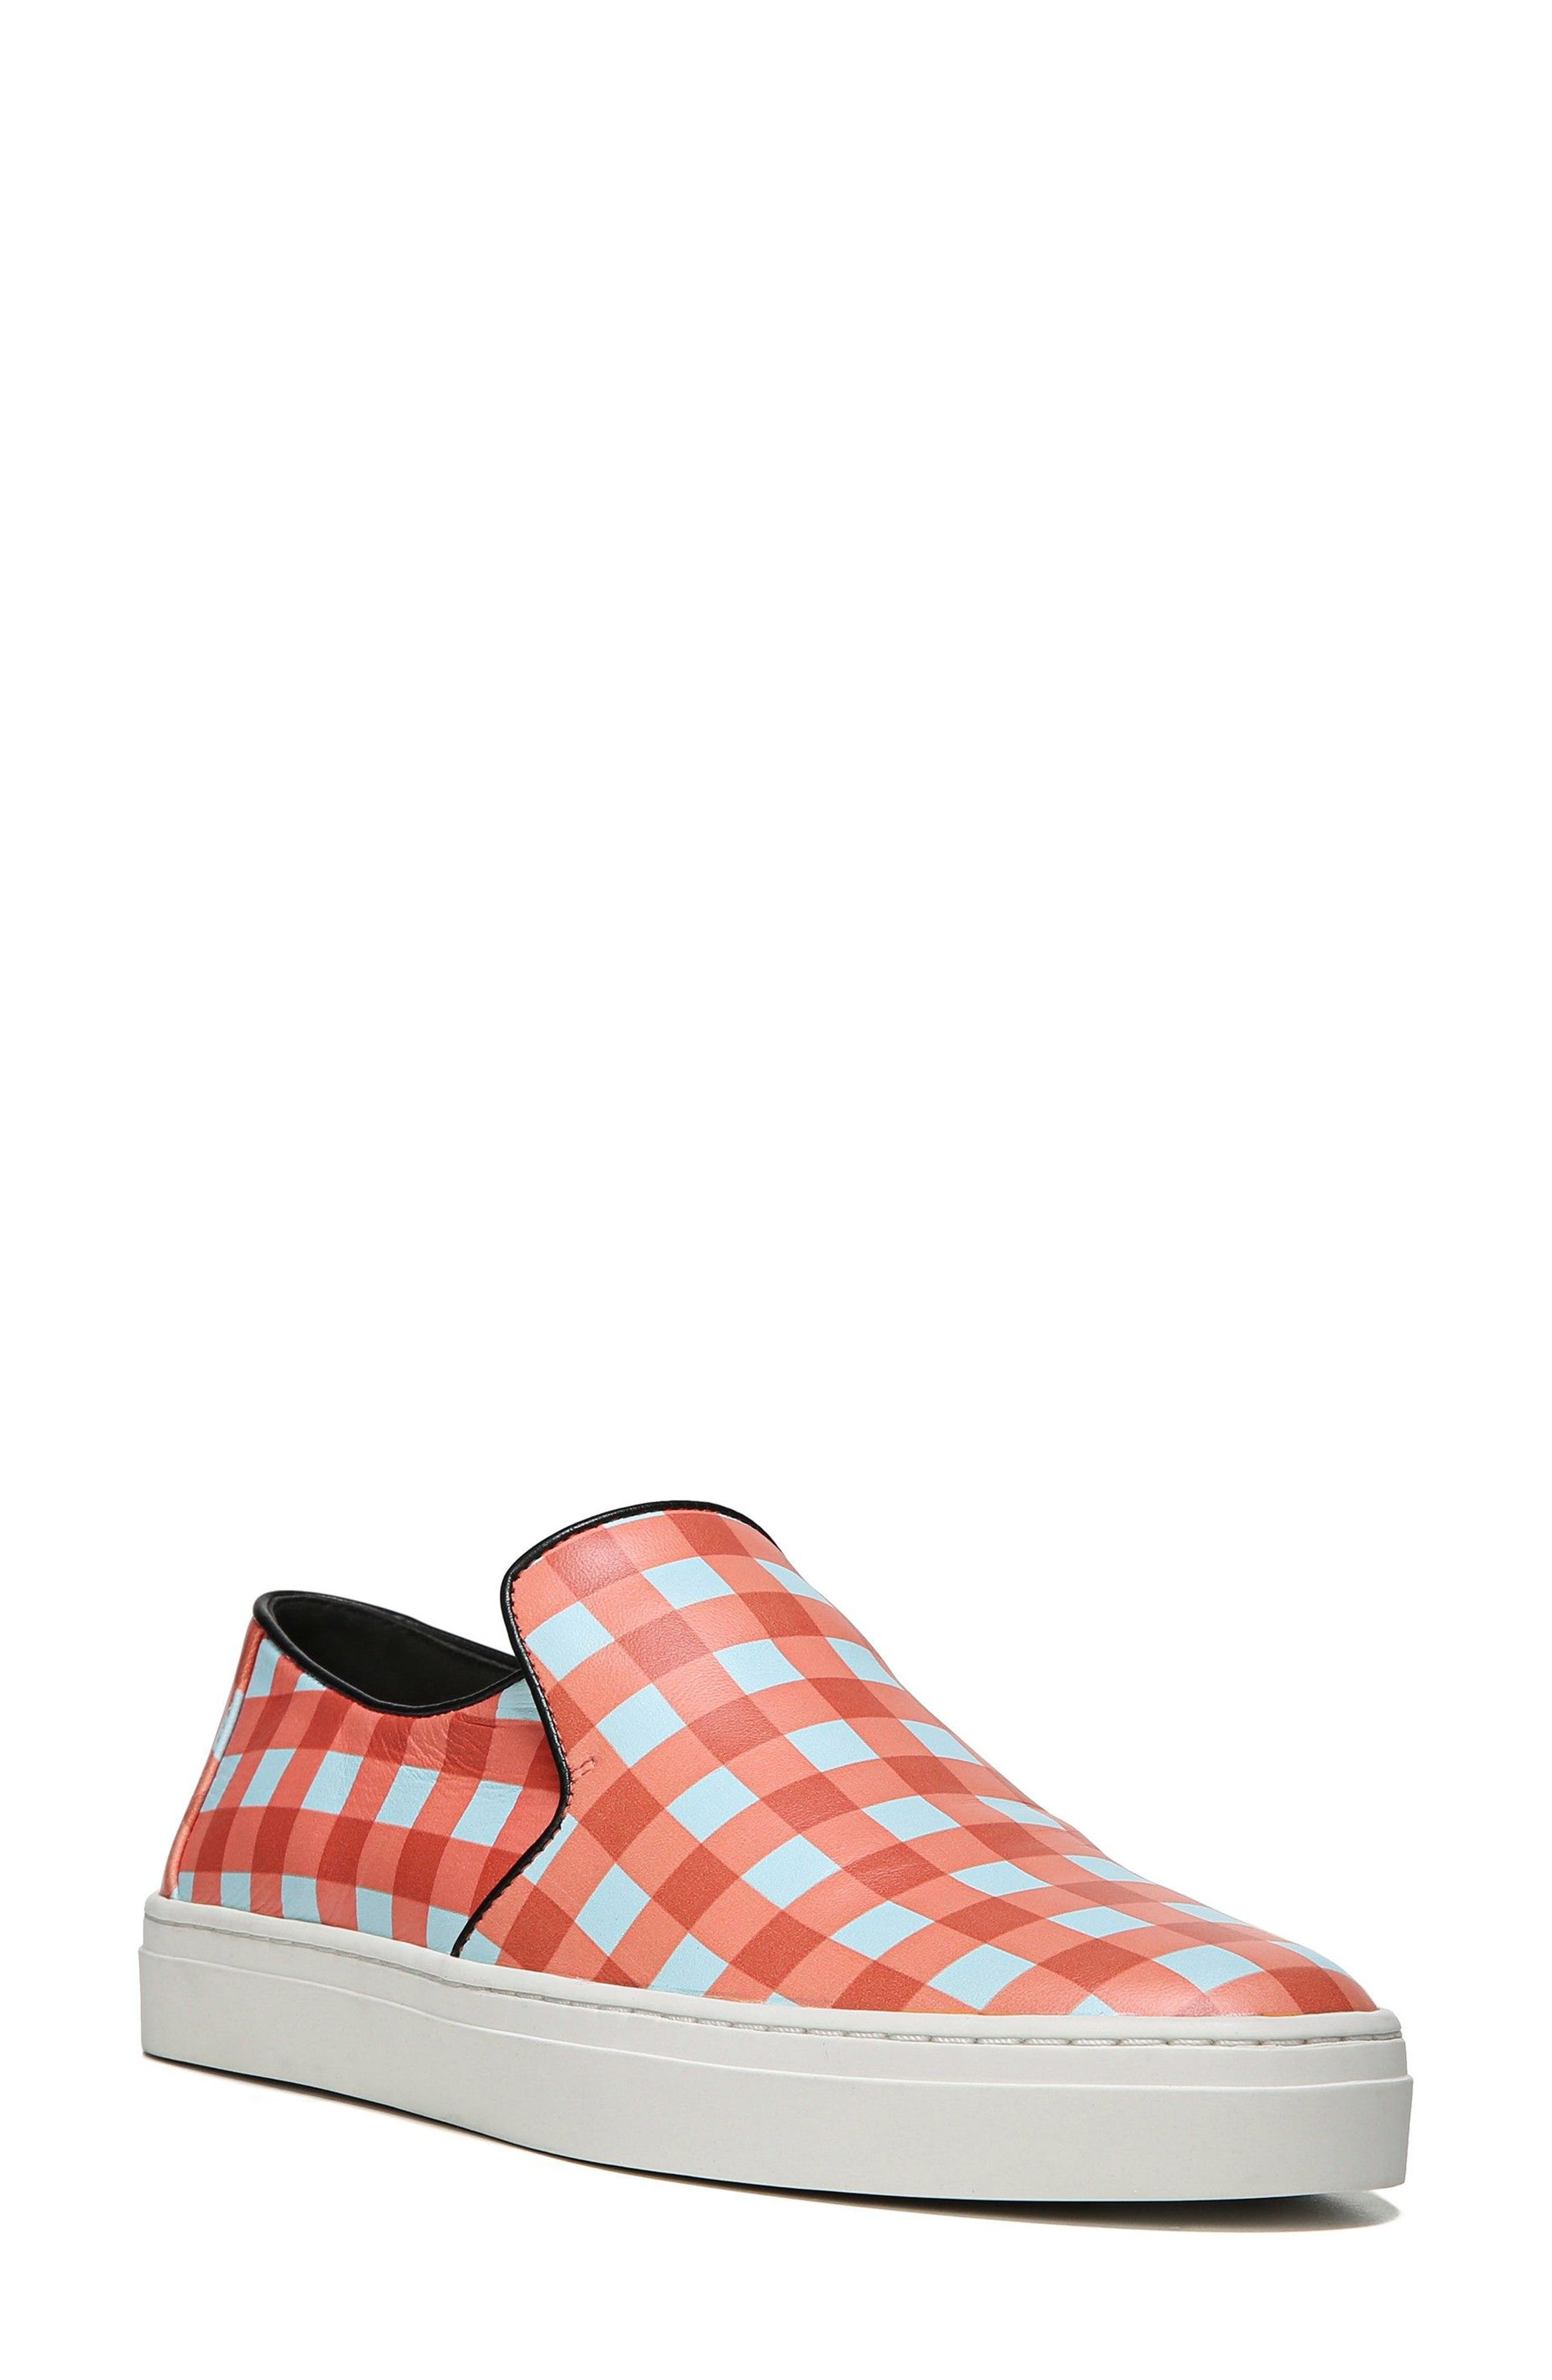 Budapest Slip-On Sneaker,                         Main,                         color, Bold Red/ Black